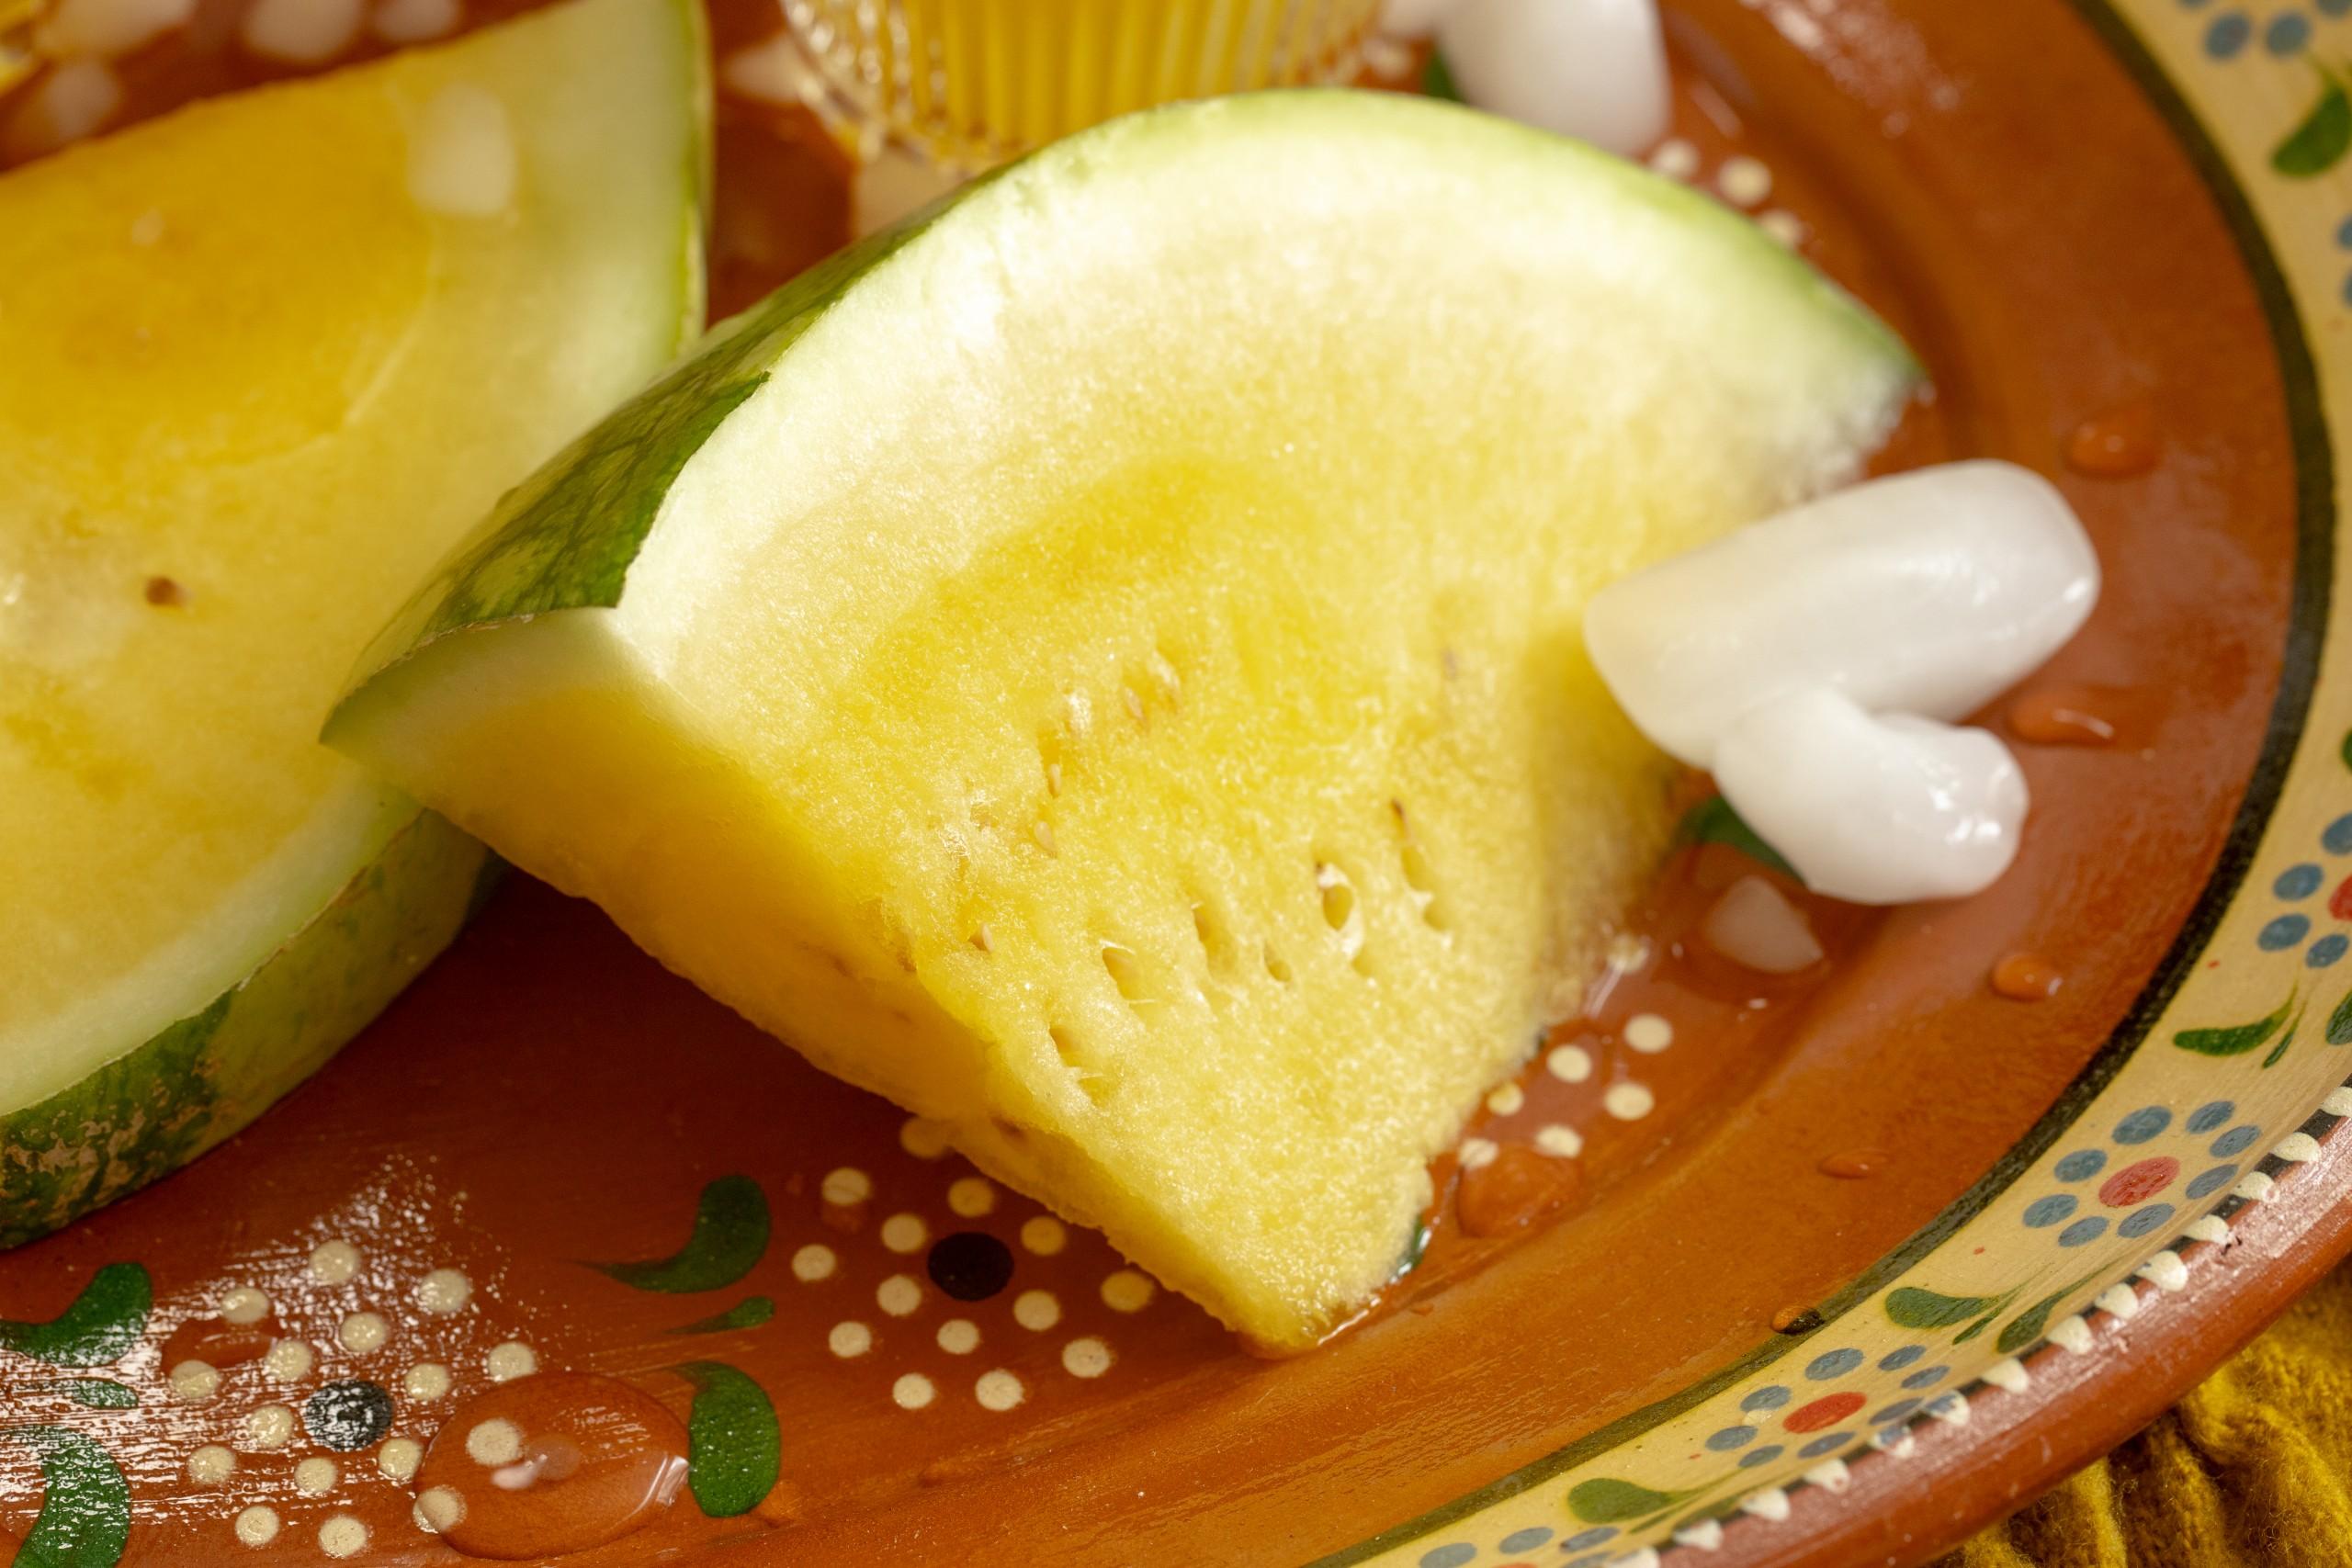 yellow watermelon grown in texas